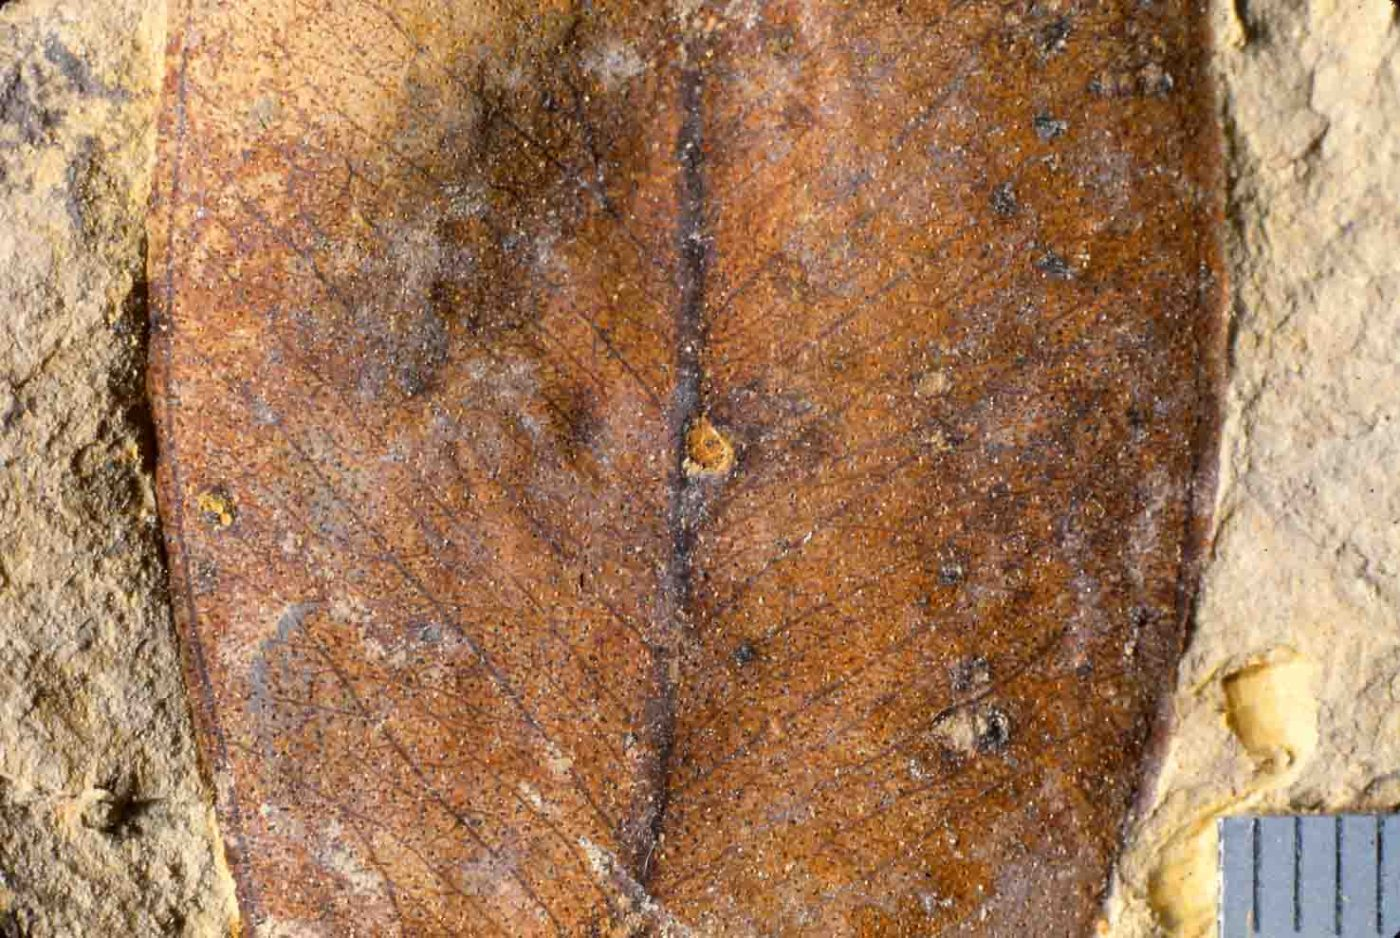 Fossil Eucalyptus leaf from New Zealand Miocene